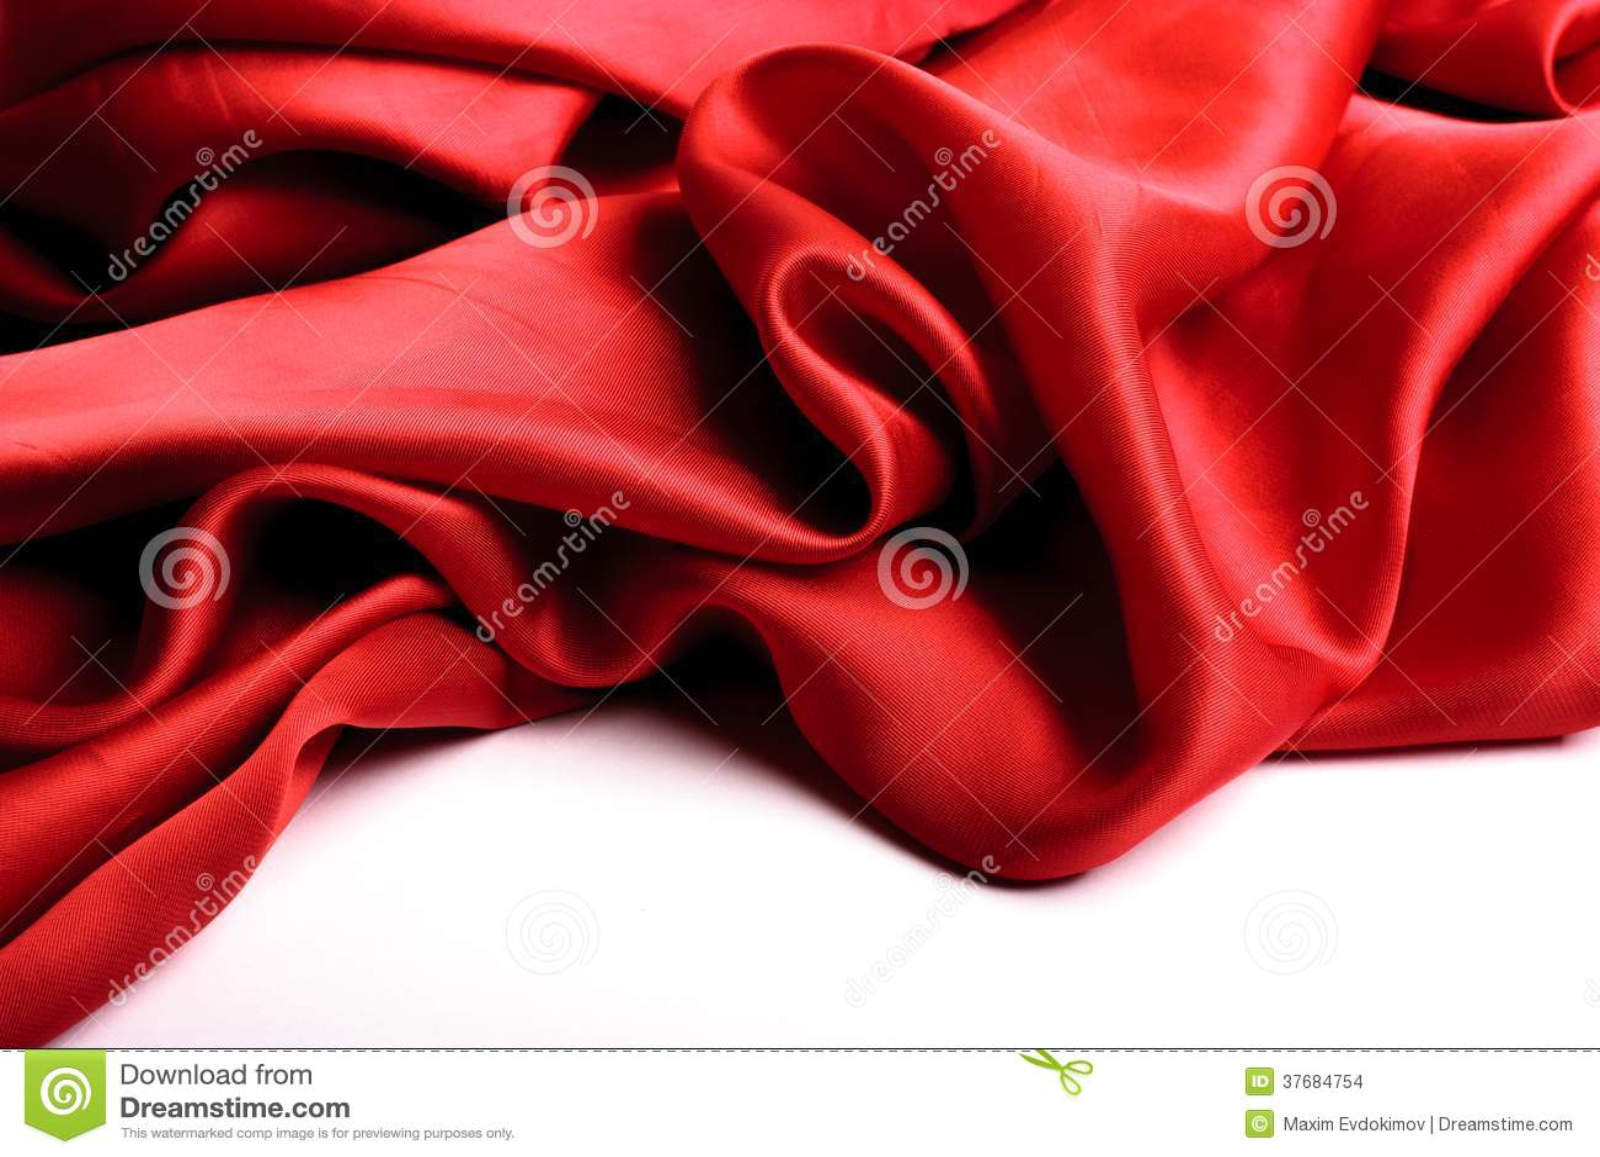 Red Satin Border